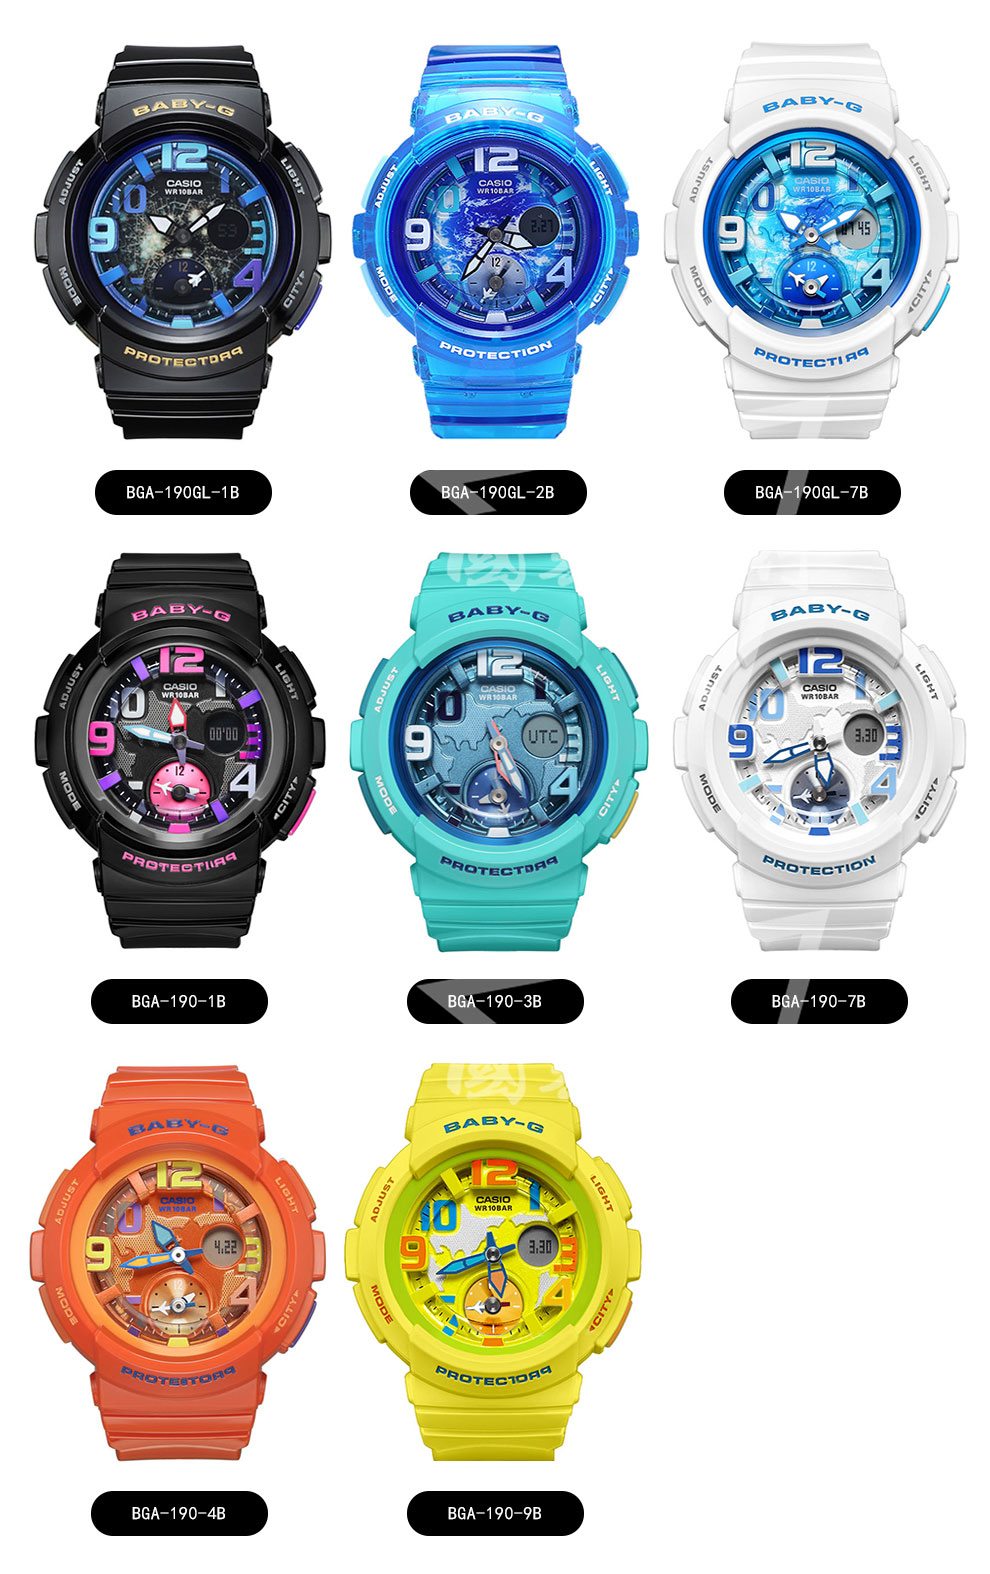 Unlimited Service Casio Watch Baby G Series Fashion Bga 190 1b Technical